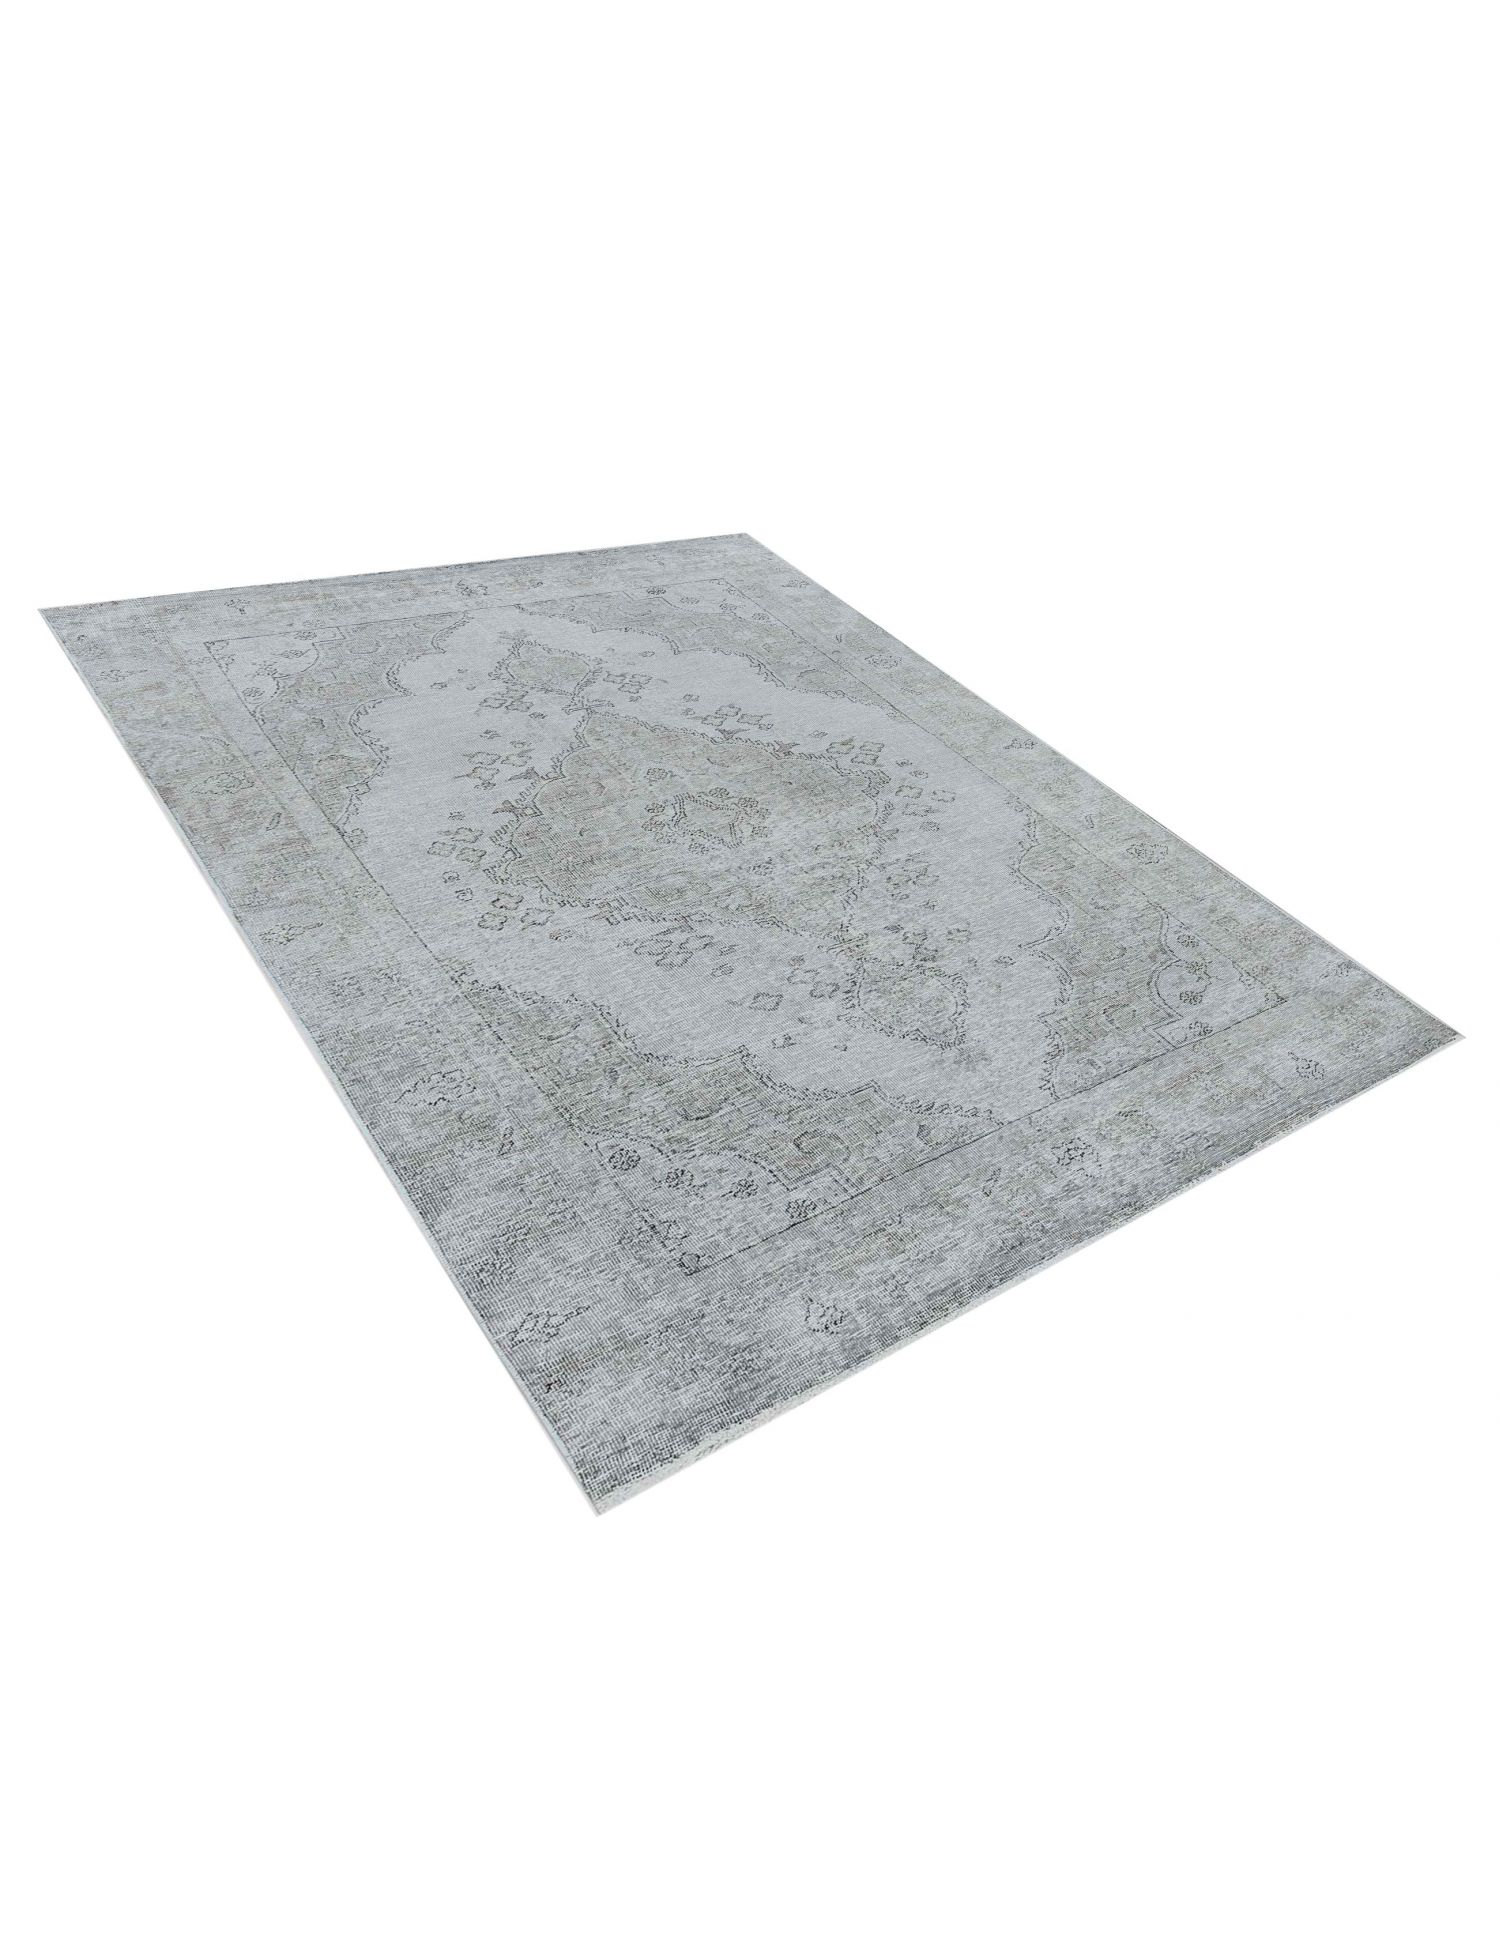 Vintage Perserteppich  grau <br/>297 x 190 cm